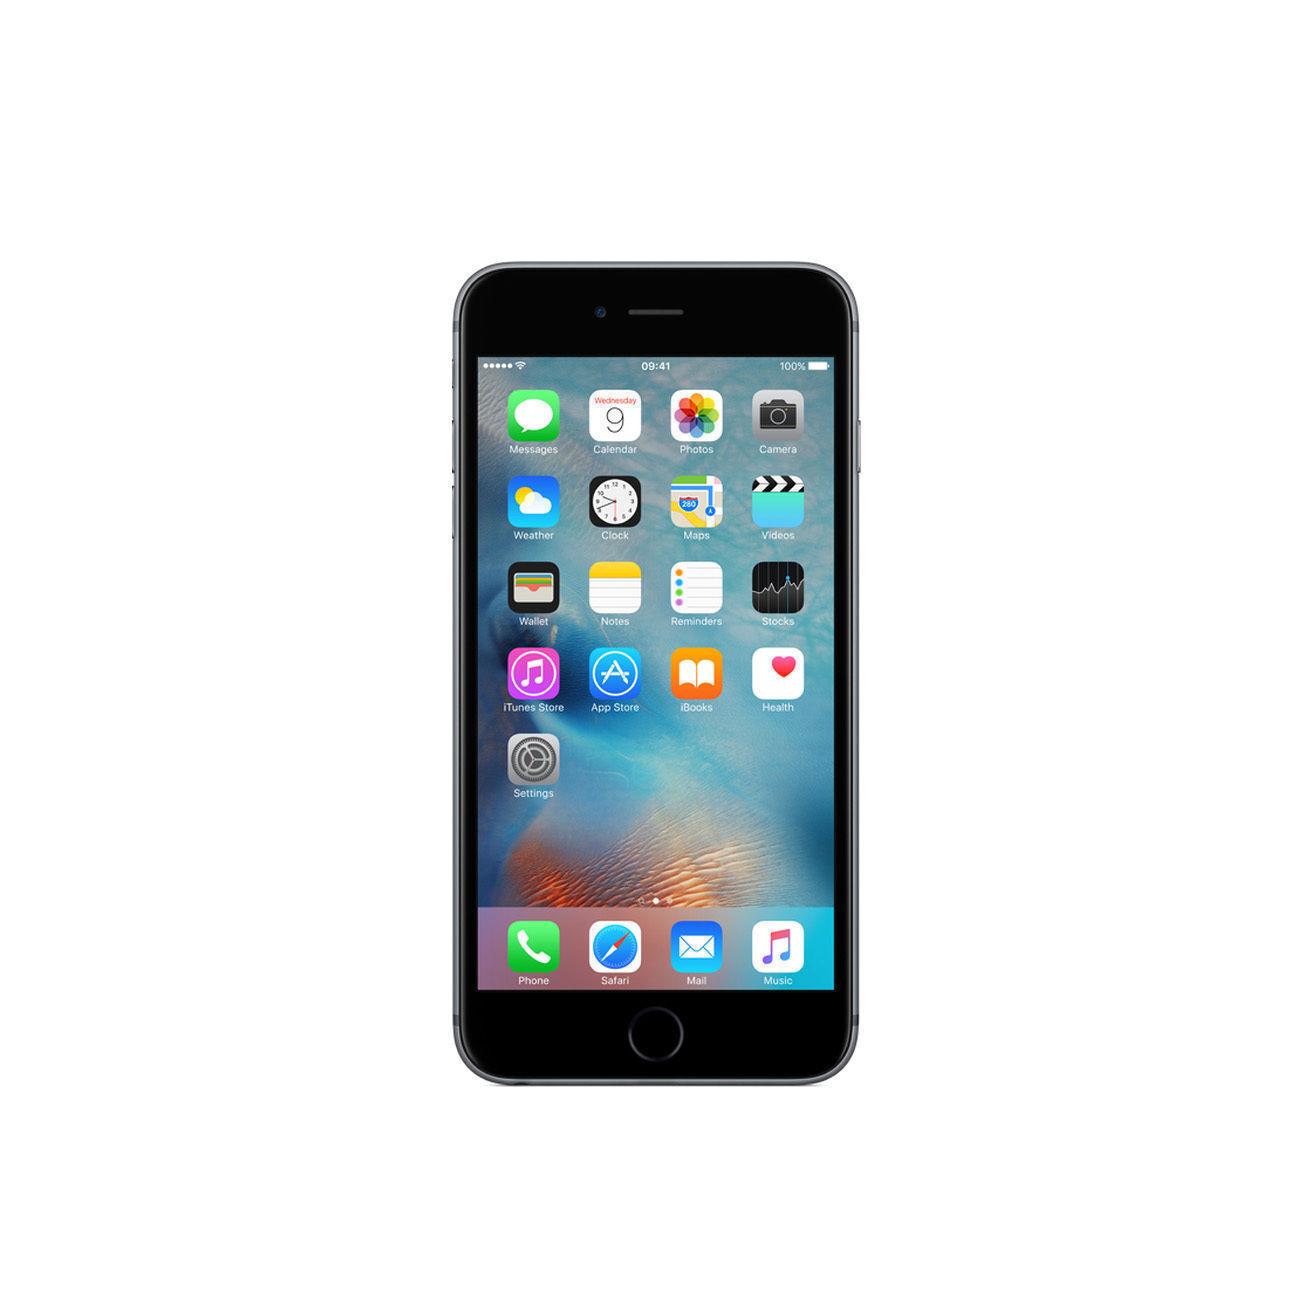 b79f4862d Apple iPhone 6s Plus - 128GB - Space Gray (Verizon) A1687 (CDMA + GSM) for  sale online